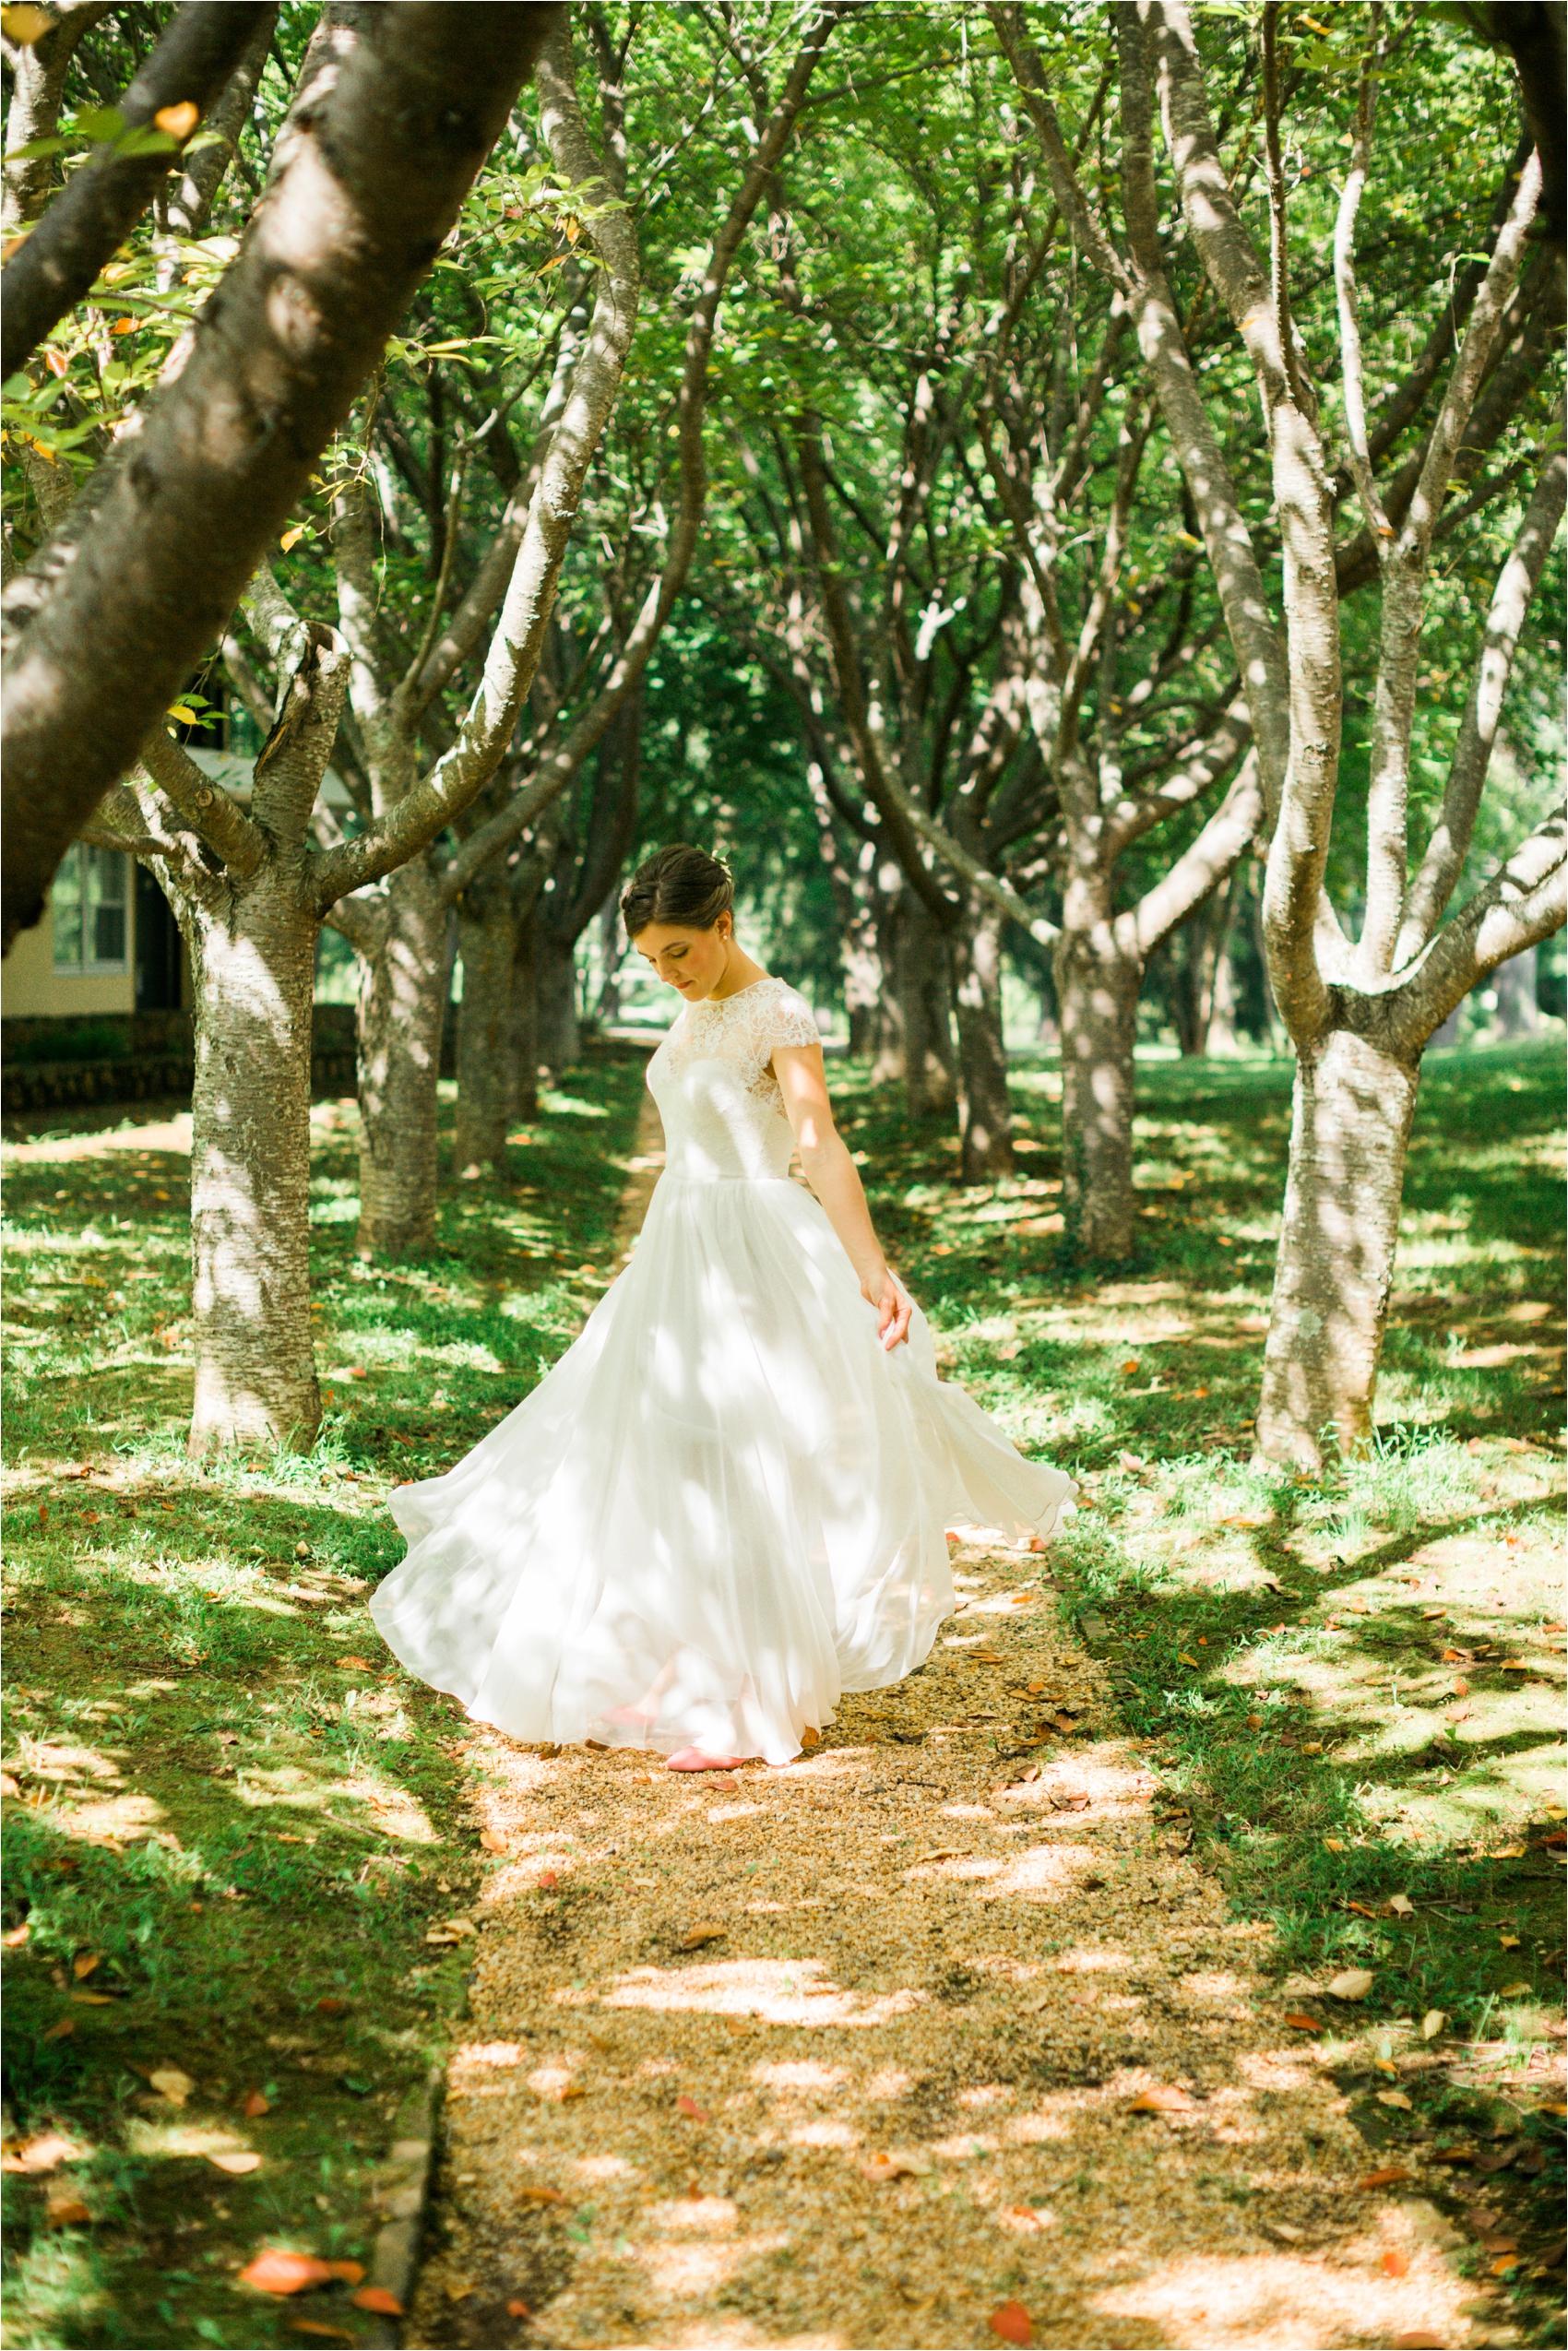 Feather-and-Oak-Rainforest-Trust-Virginia-Wedding-0202.jpg